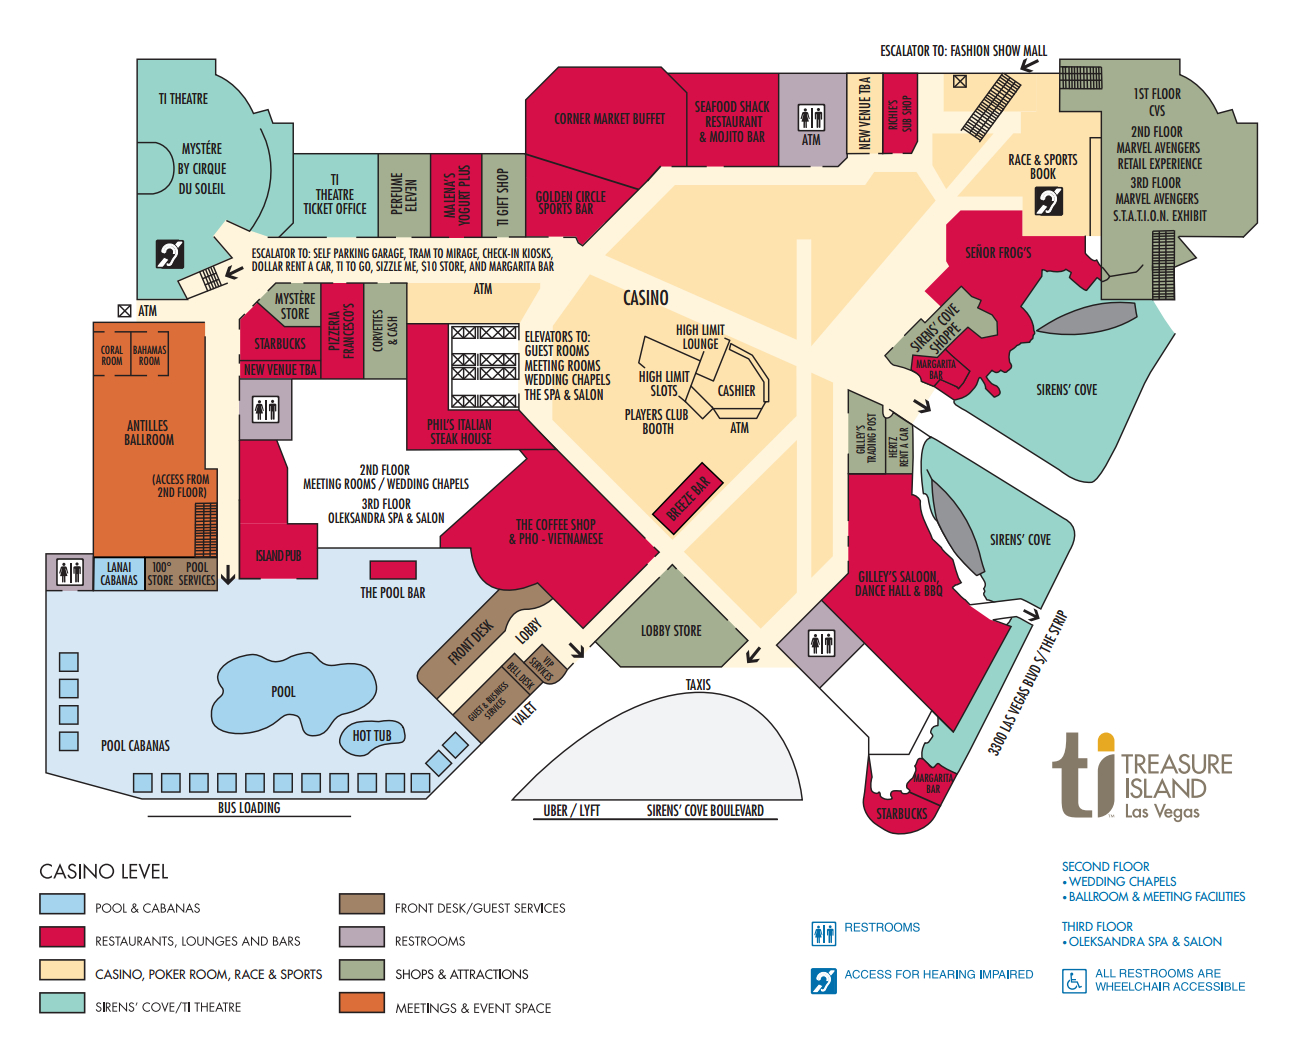 Ti Hotel Property Map Treasure Island Hotel And Casino, Las Vegas - Treasure Island Florida Map